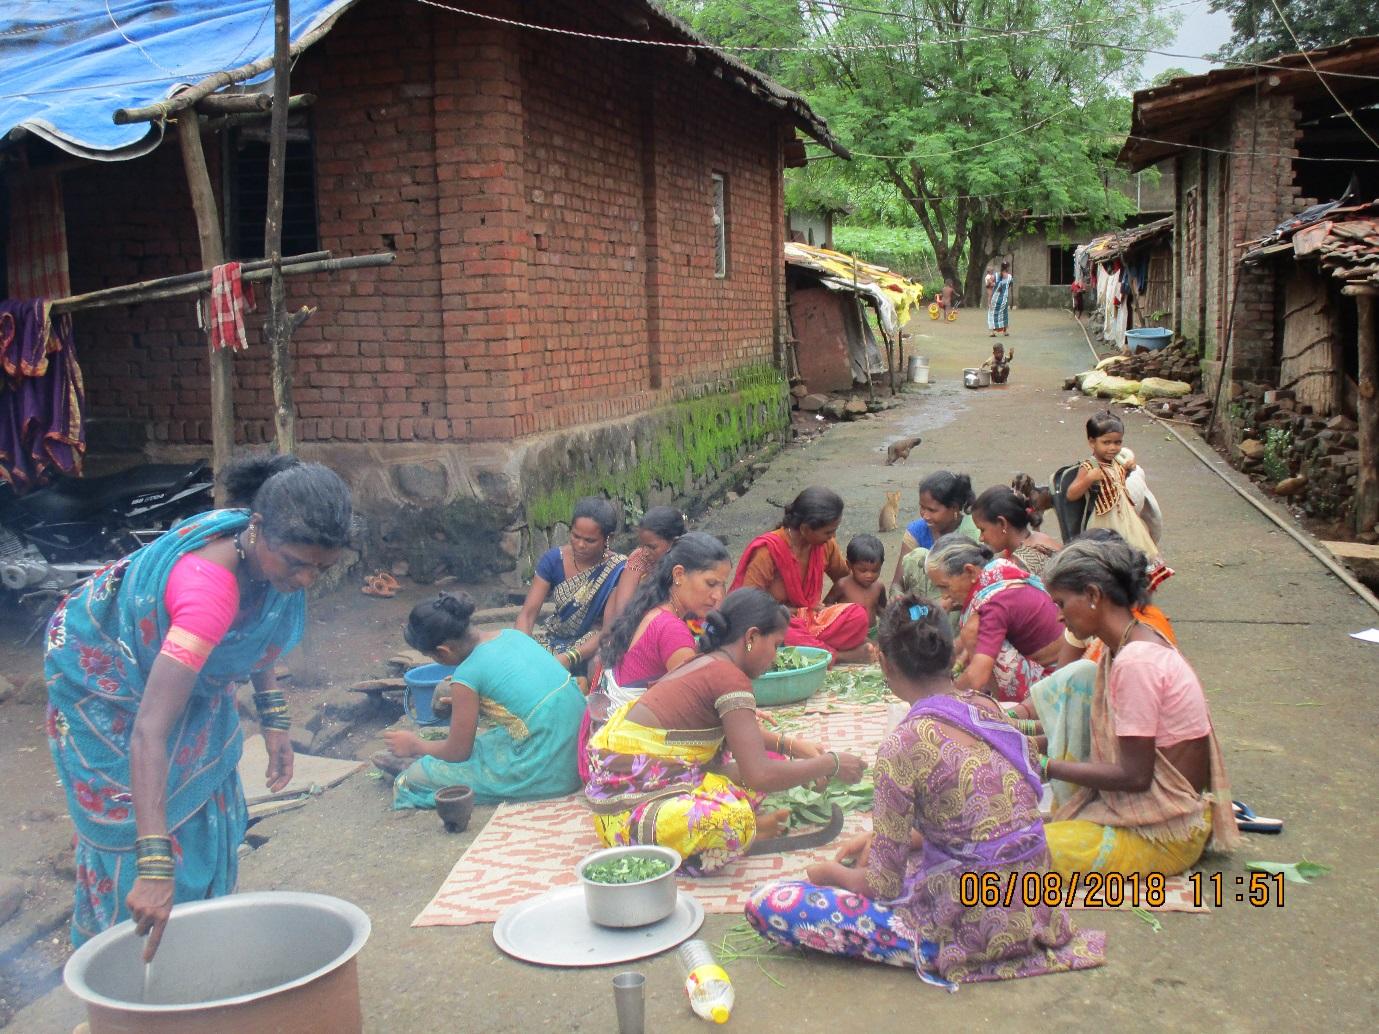 Herbal medicine prepared by the Tribal women, Rees